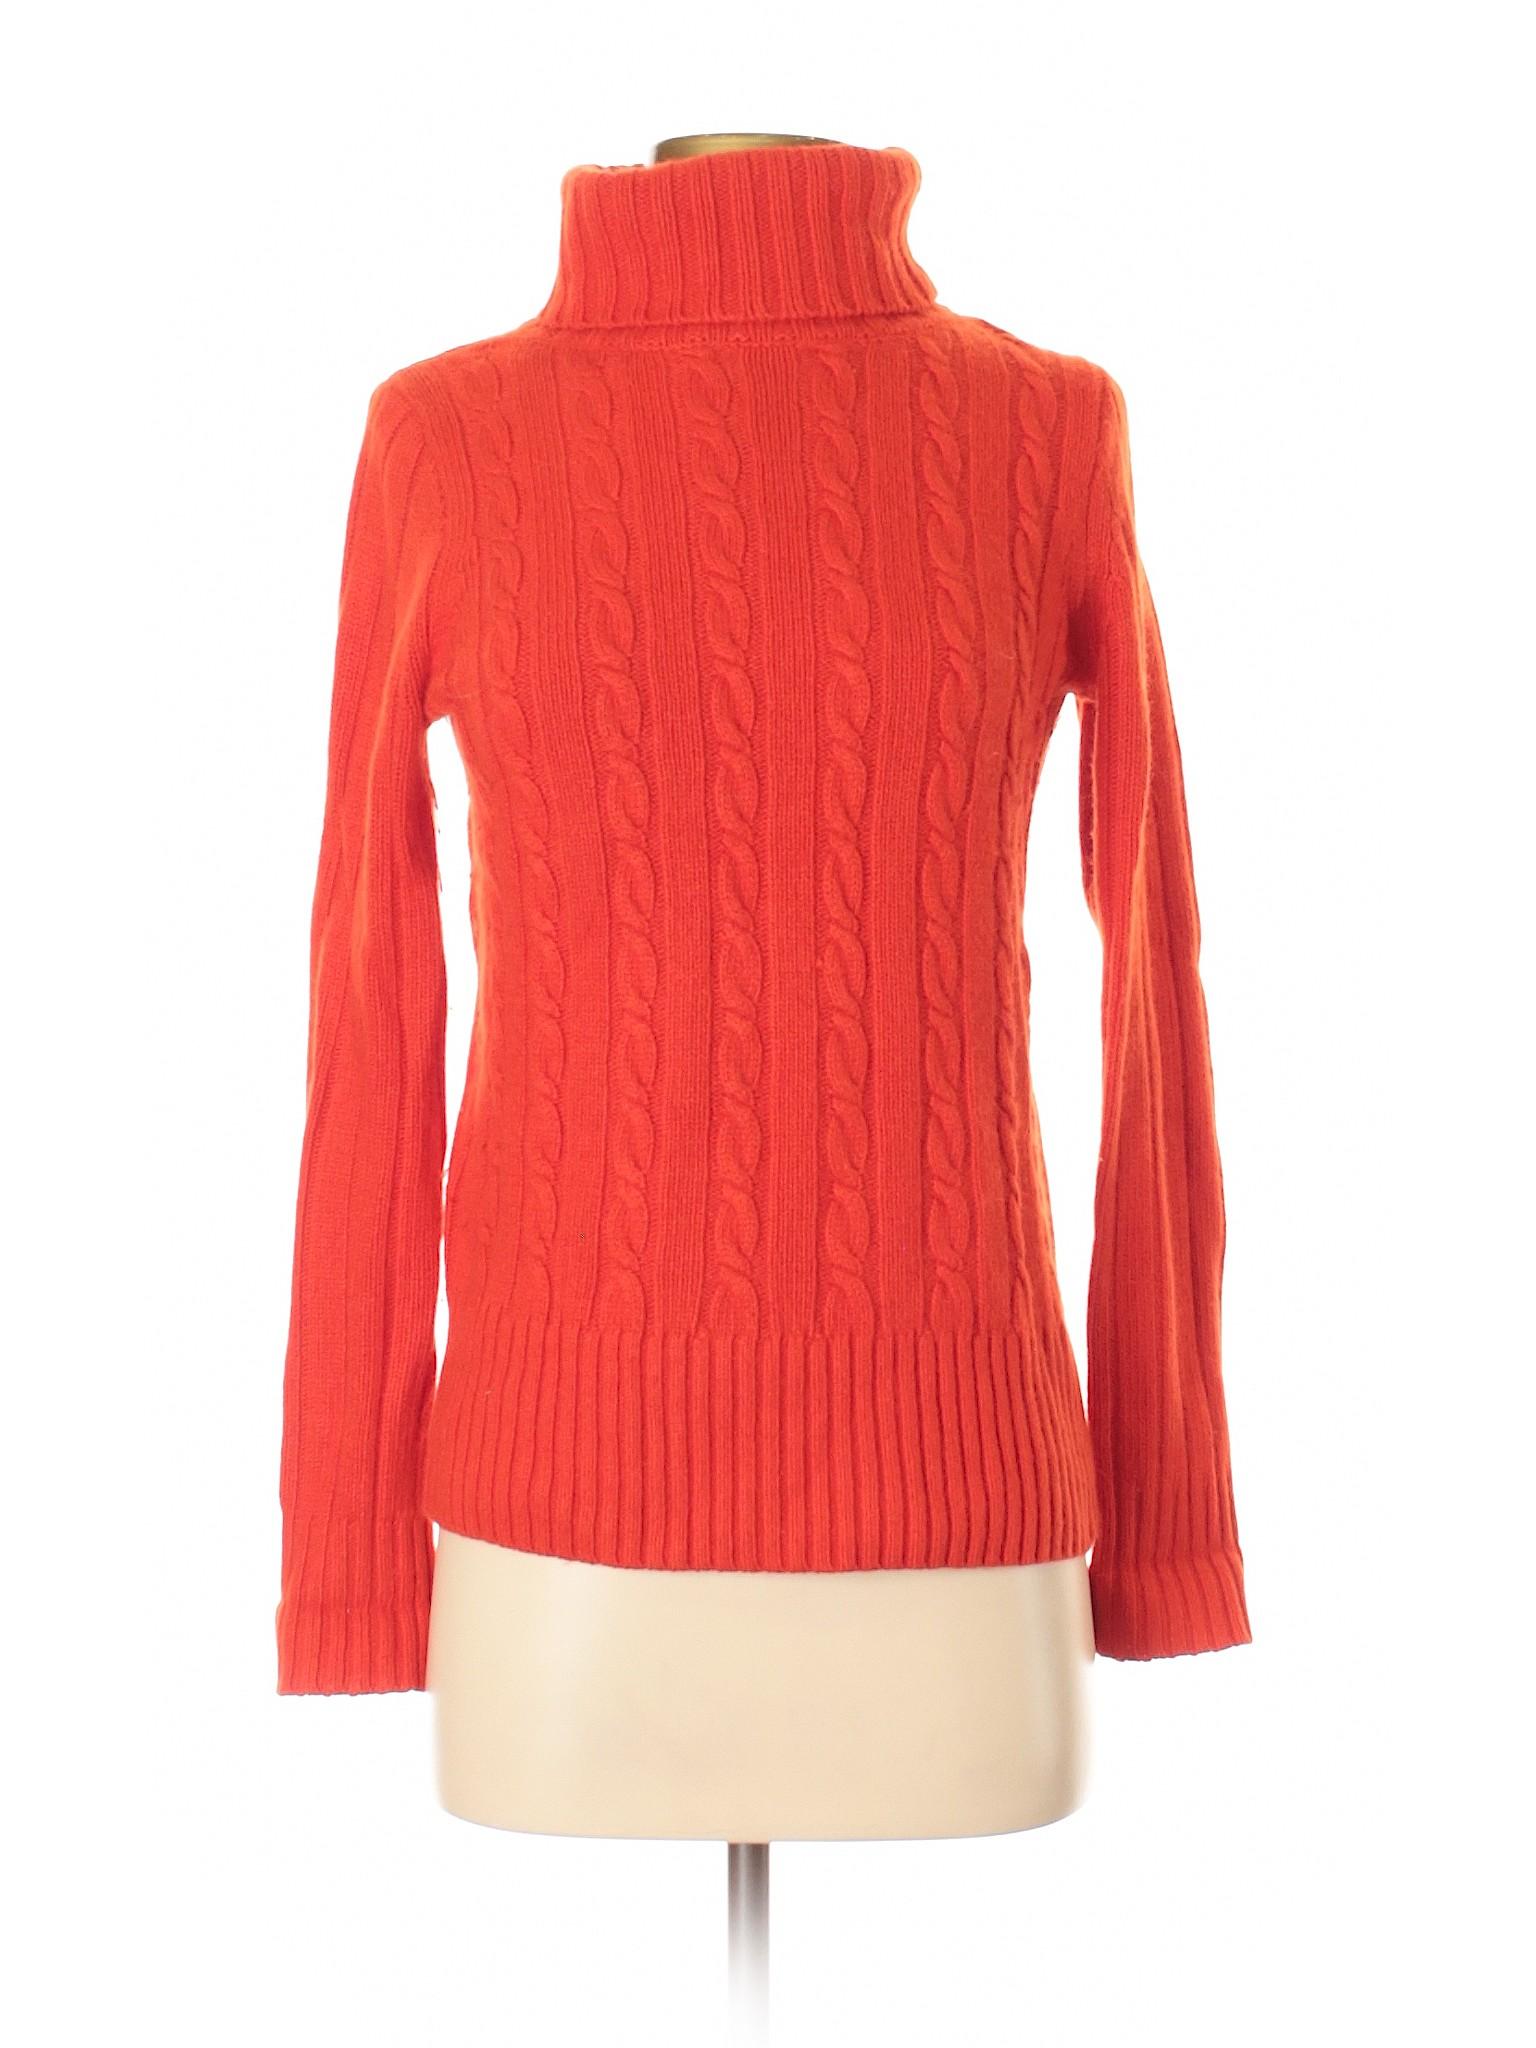 winter Turtleneck Sweater Crew Boutique J 1qwd6gaa